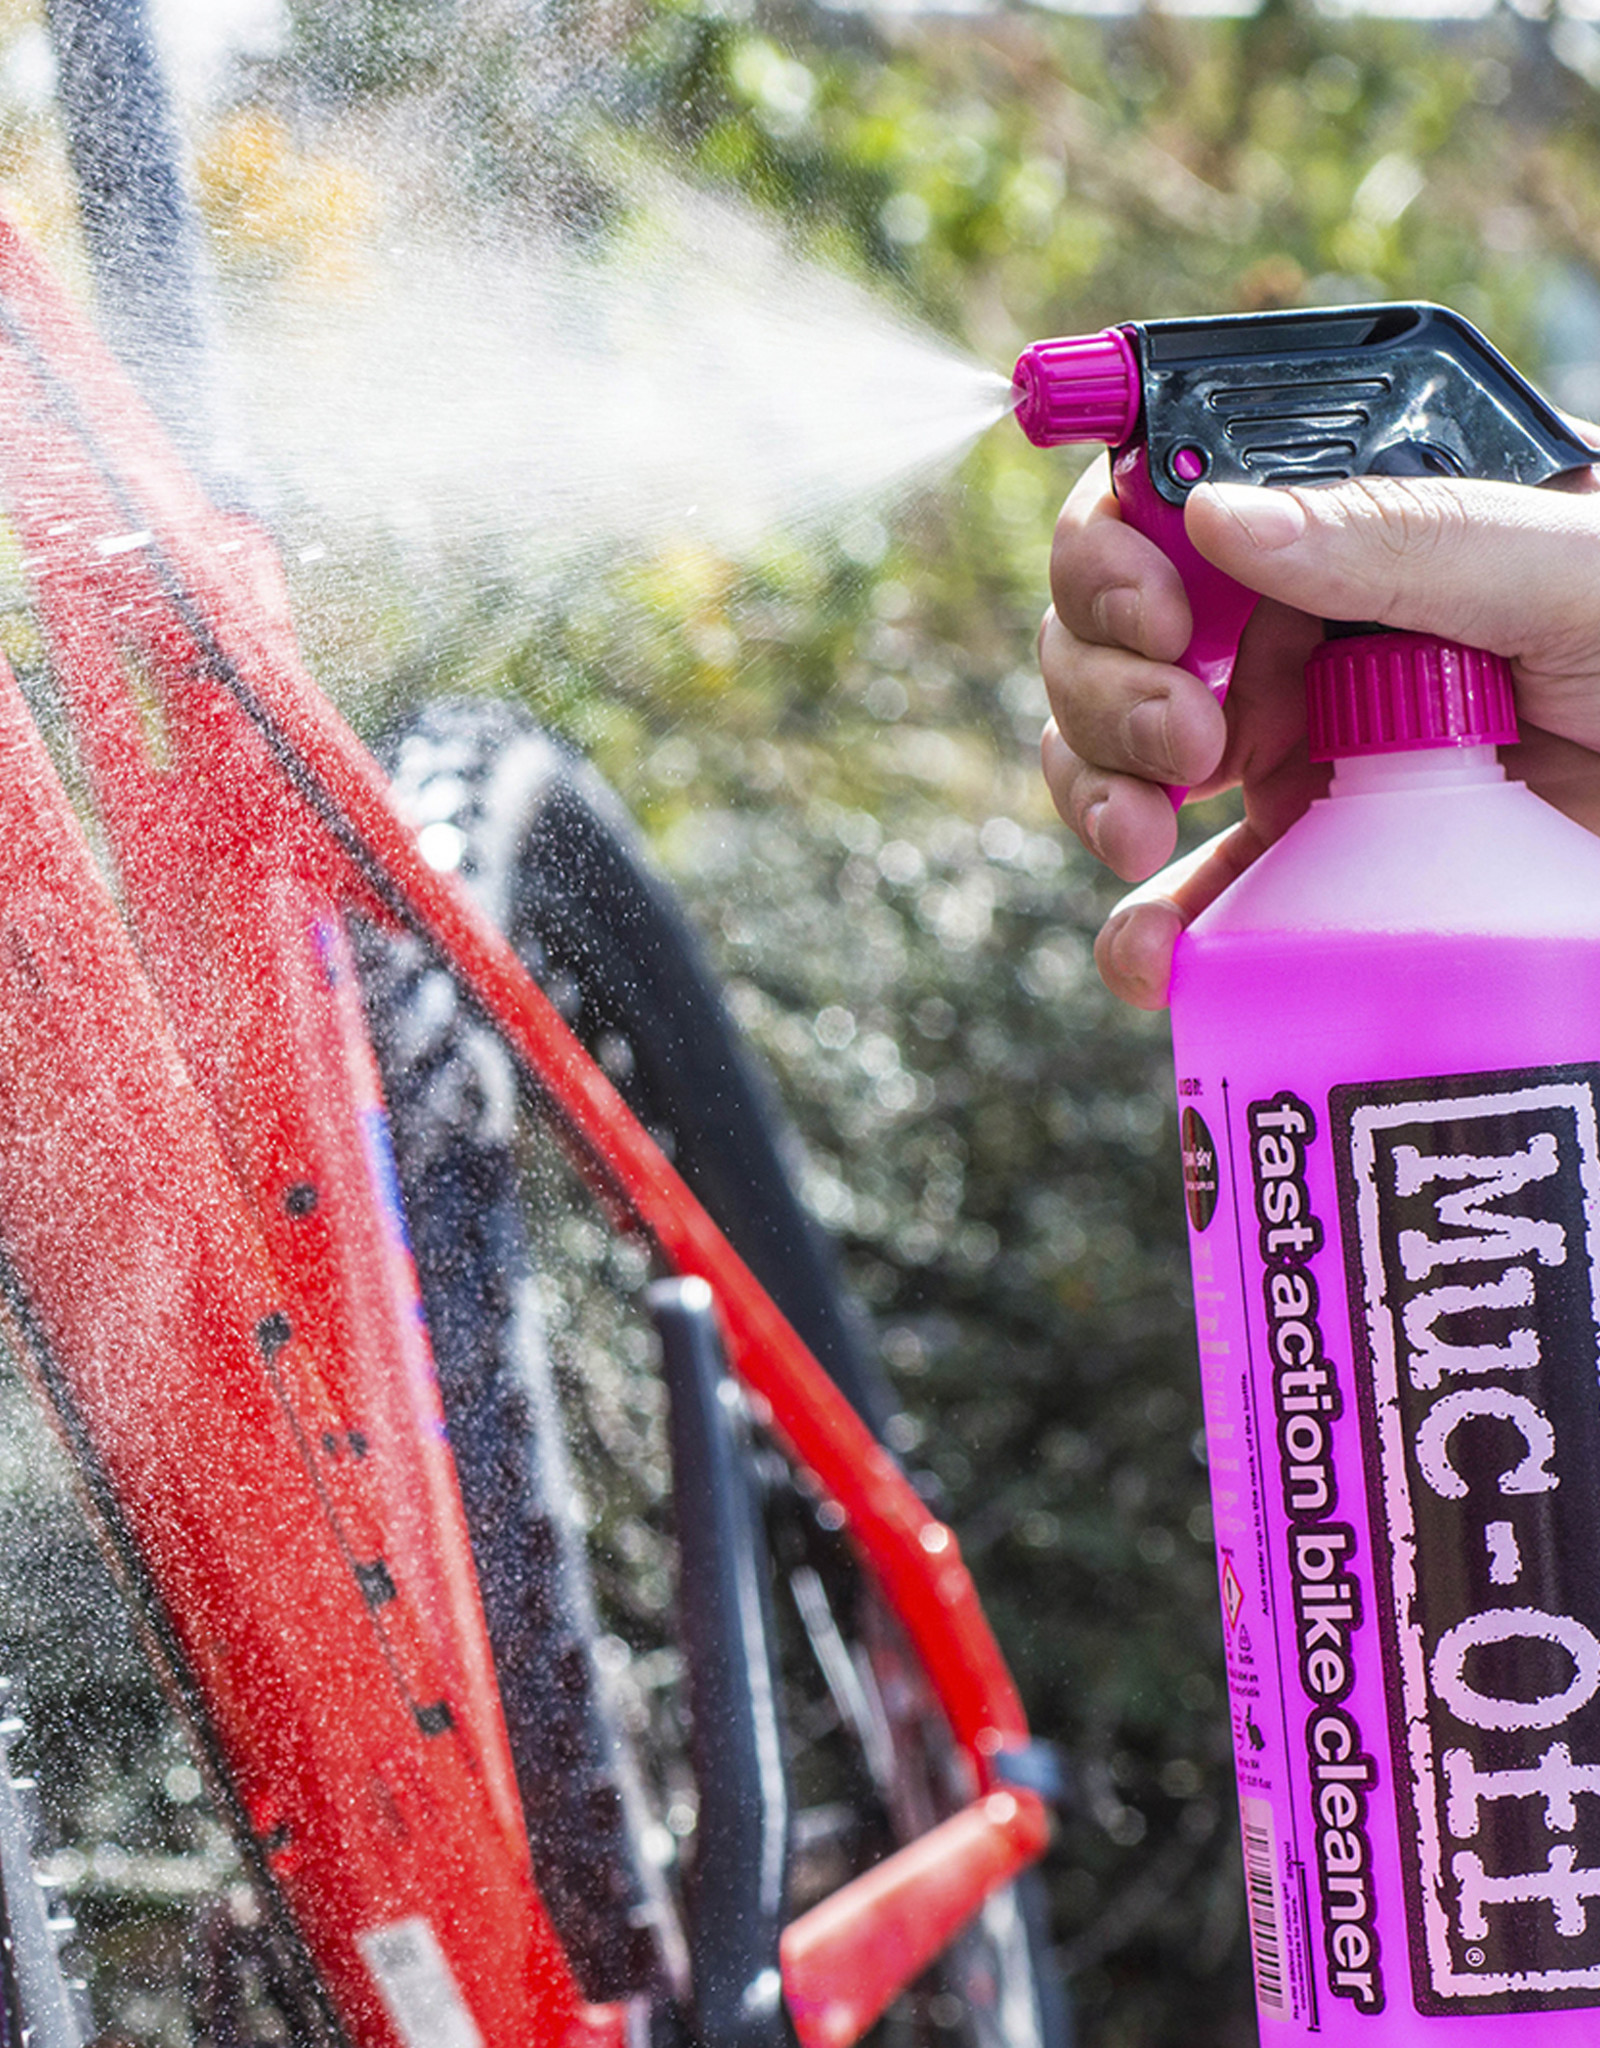 Muc-Off Muc-Off, Nettoyant de vélo Nano Tech, 1L